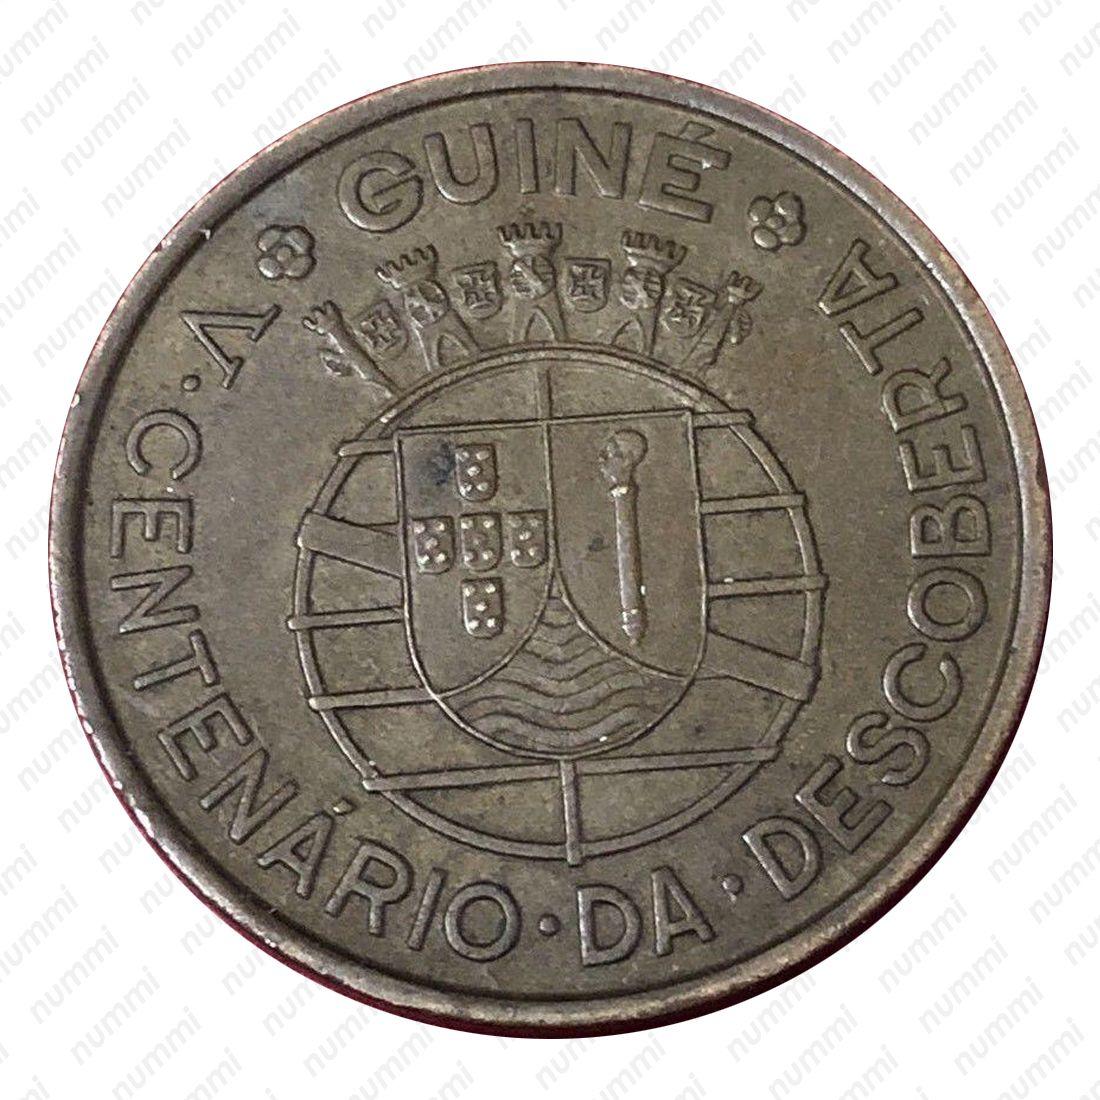 KM7 Guinea-Bissau 1946 1 Escudo